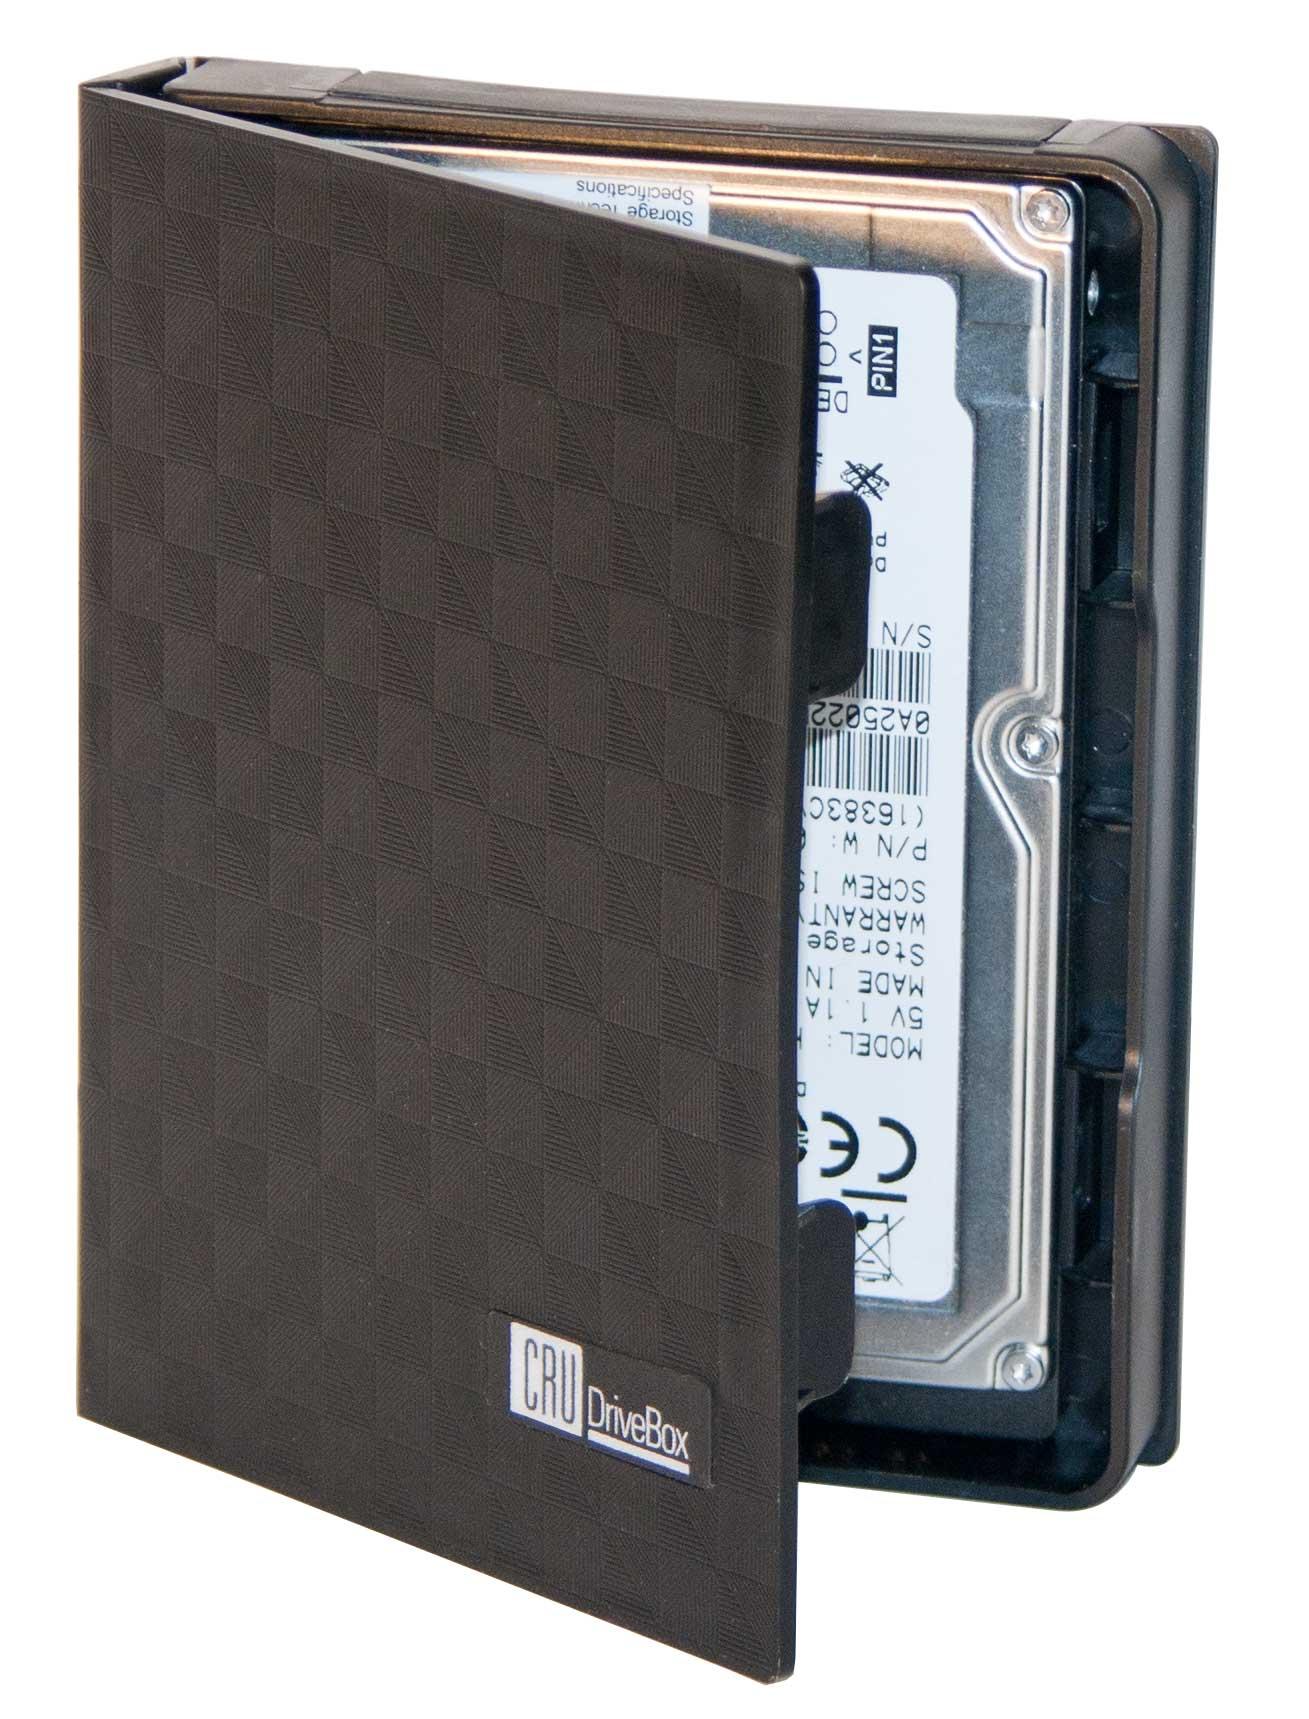 WiebeTech 10-Pack of Drivebox Mini